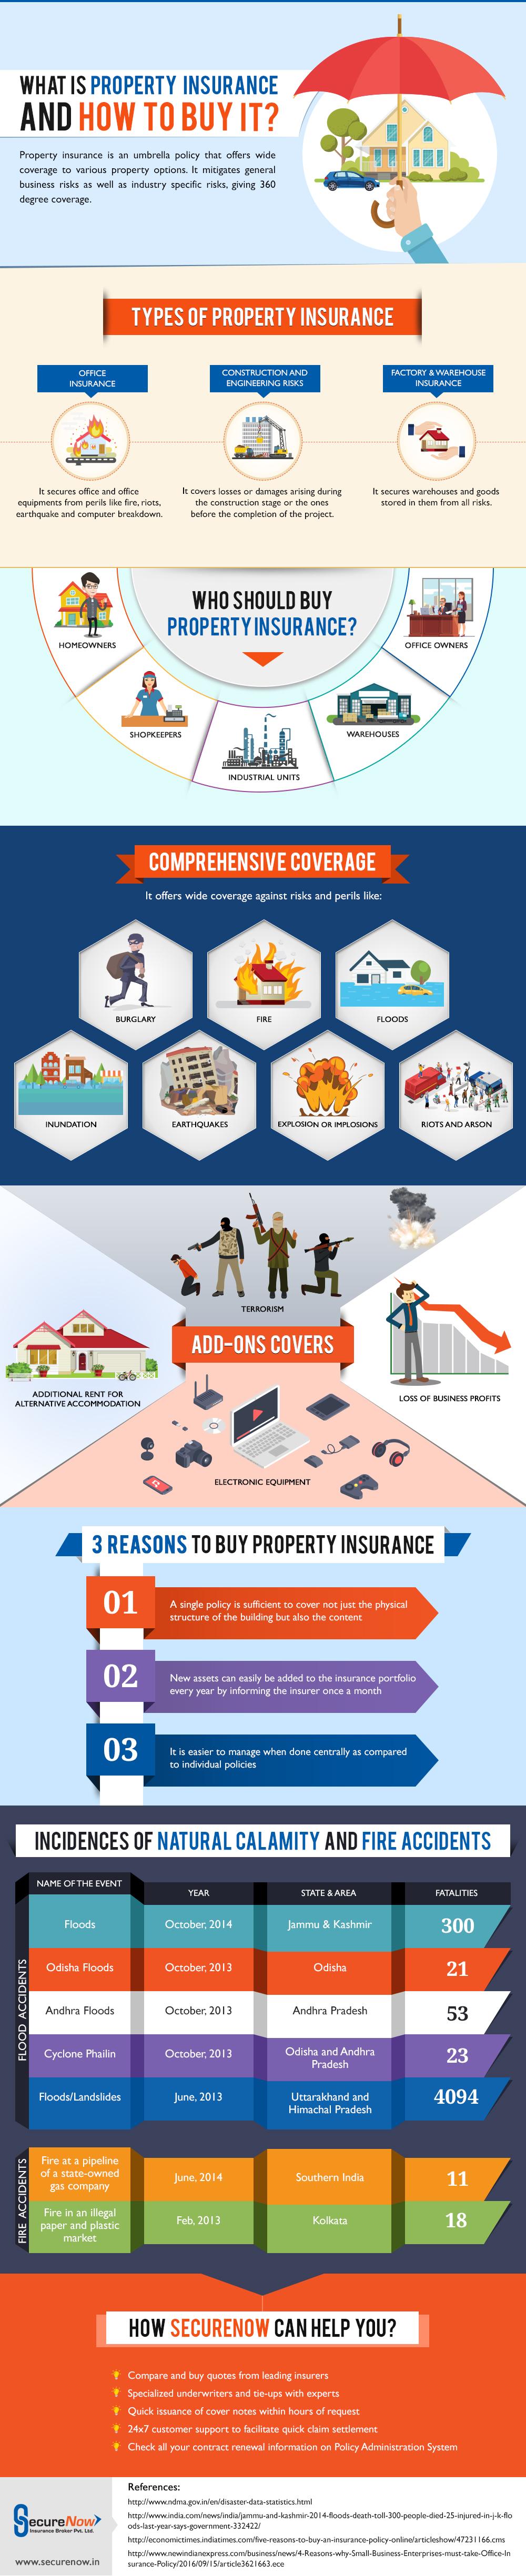 propert-insurance